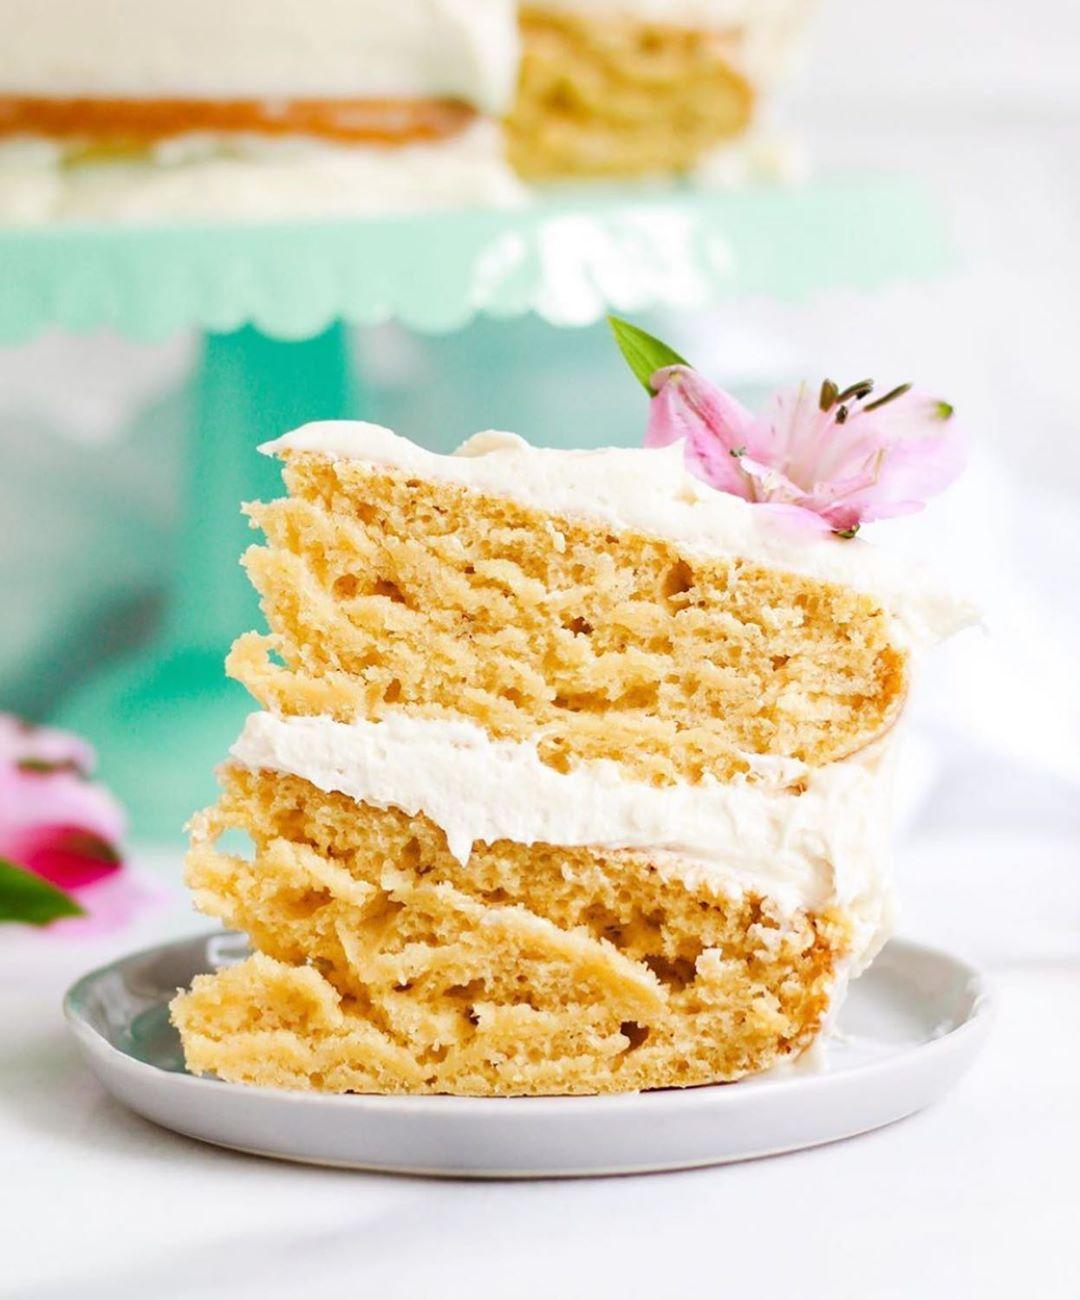 Best Of Vegan On Instagram The Best Vanilla Cake Ever By The Bananadiaries Vegan Vanilla C Vegan Vanilla Cake Vanilla Recipes Best Vanilla Cake Recipe